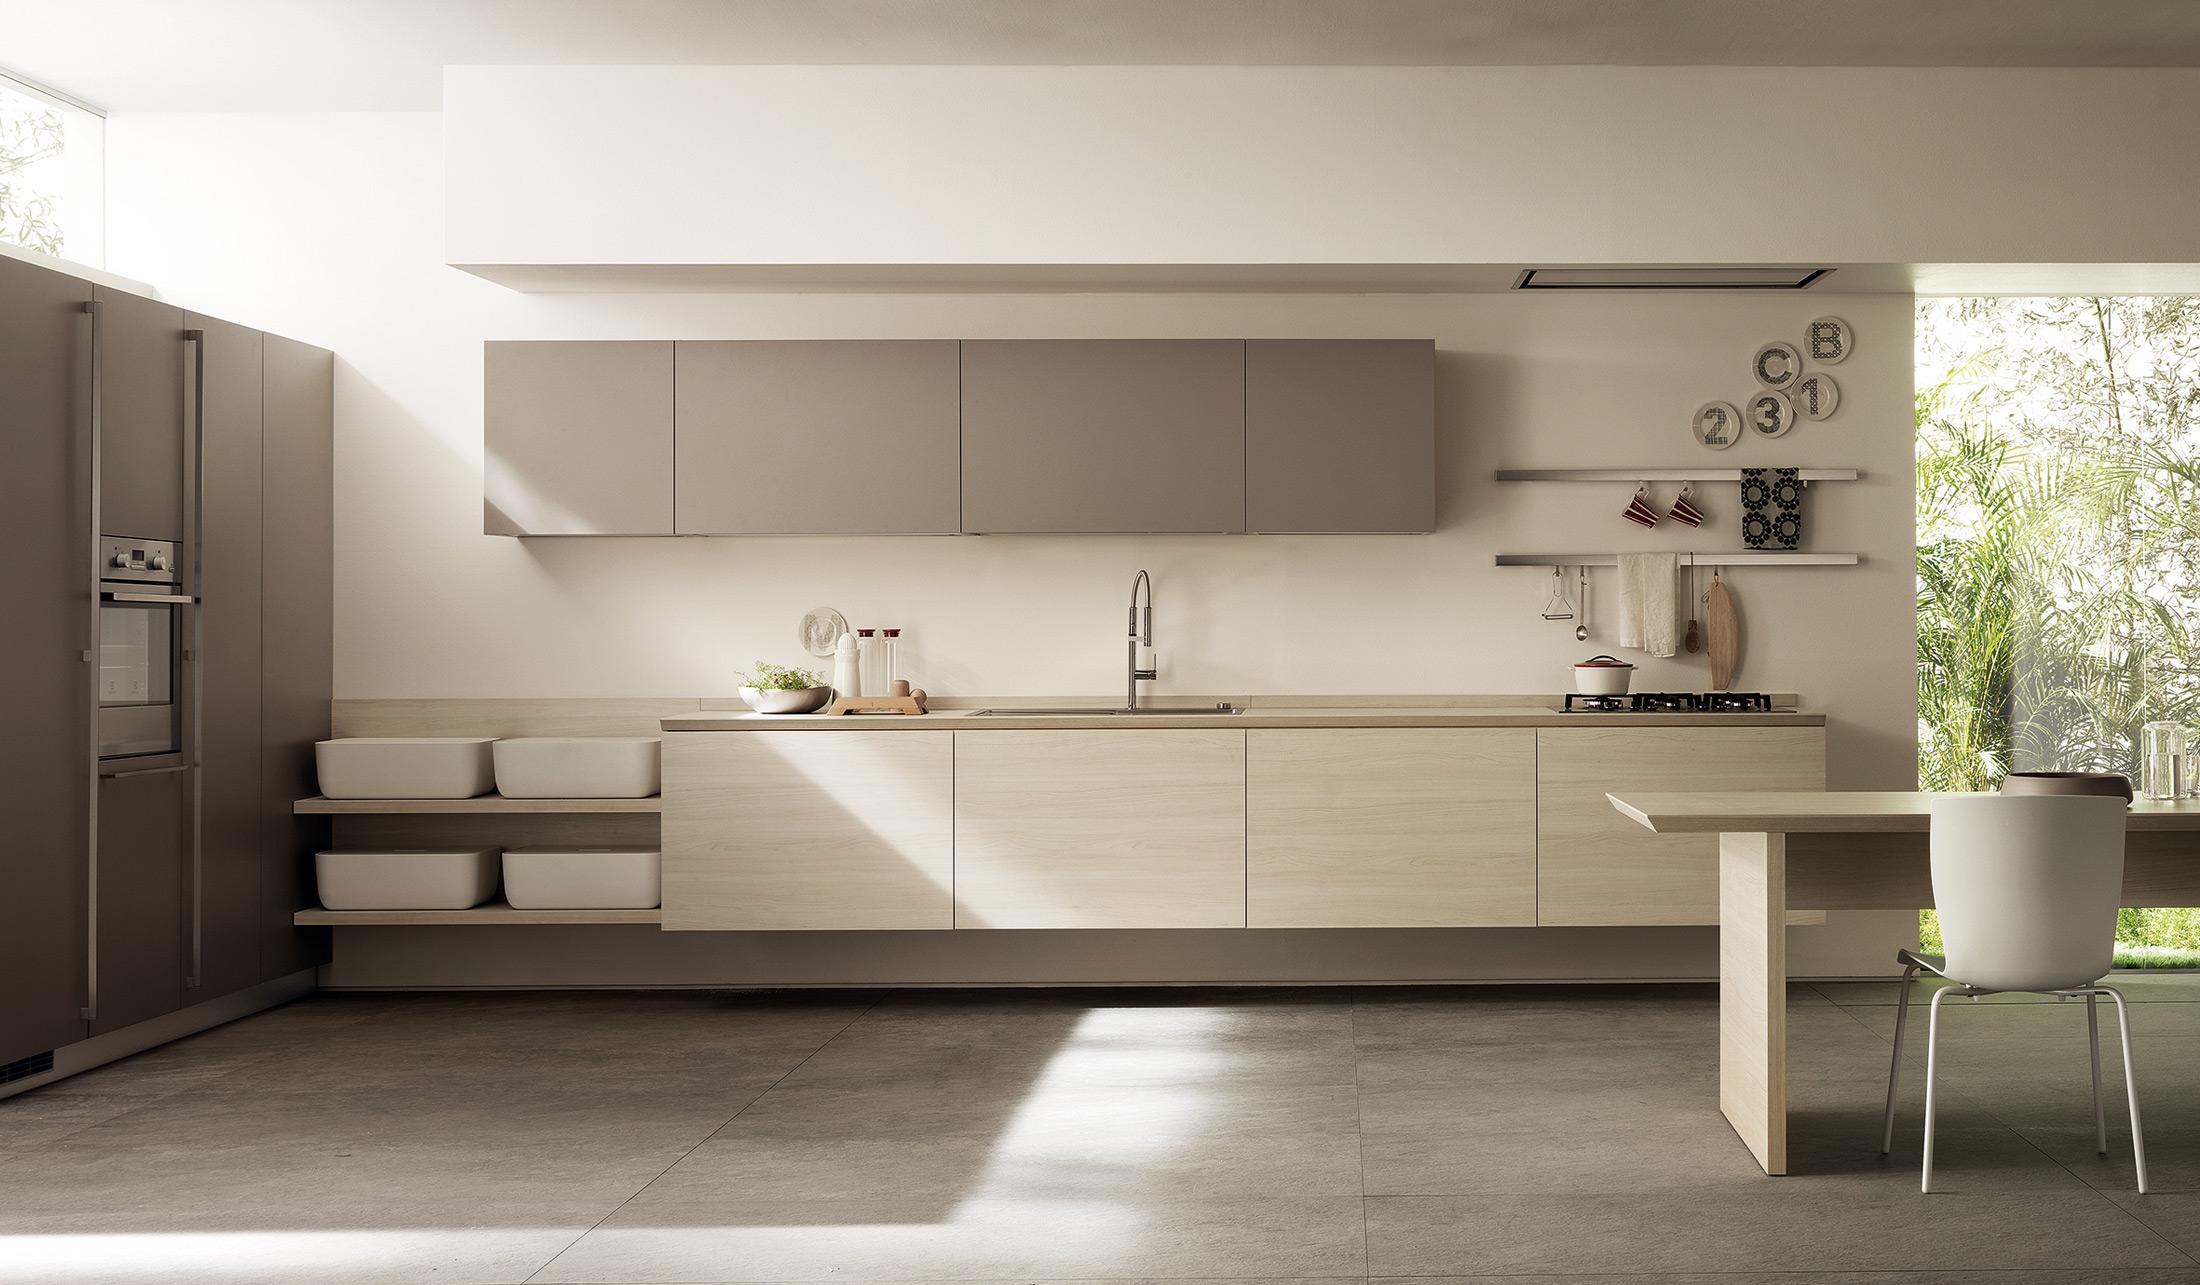 Arredamento Cucina Moderna Scavolini.Isdcyter0qucxm